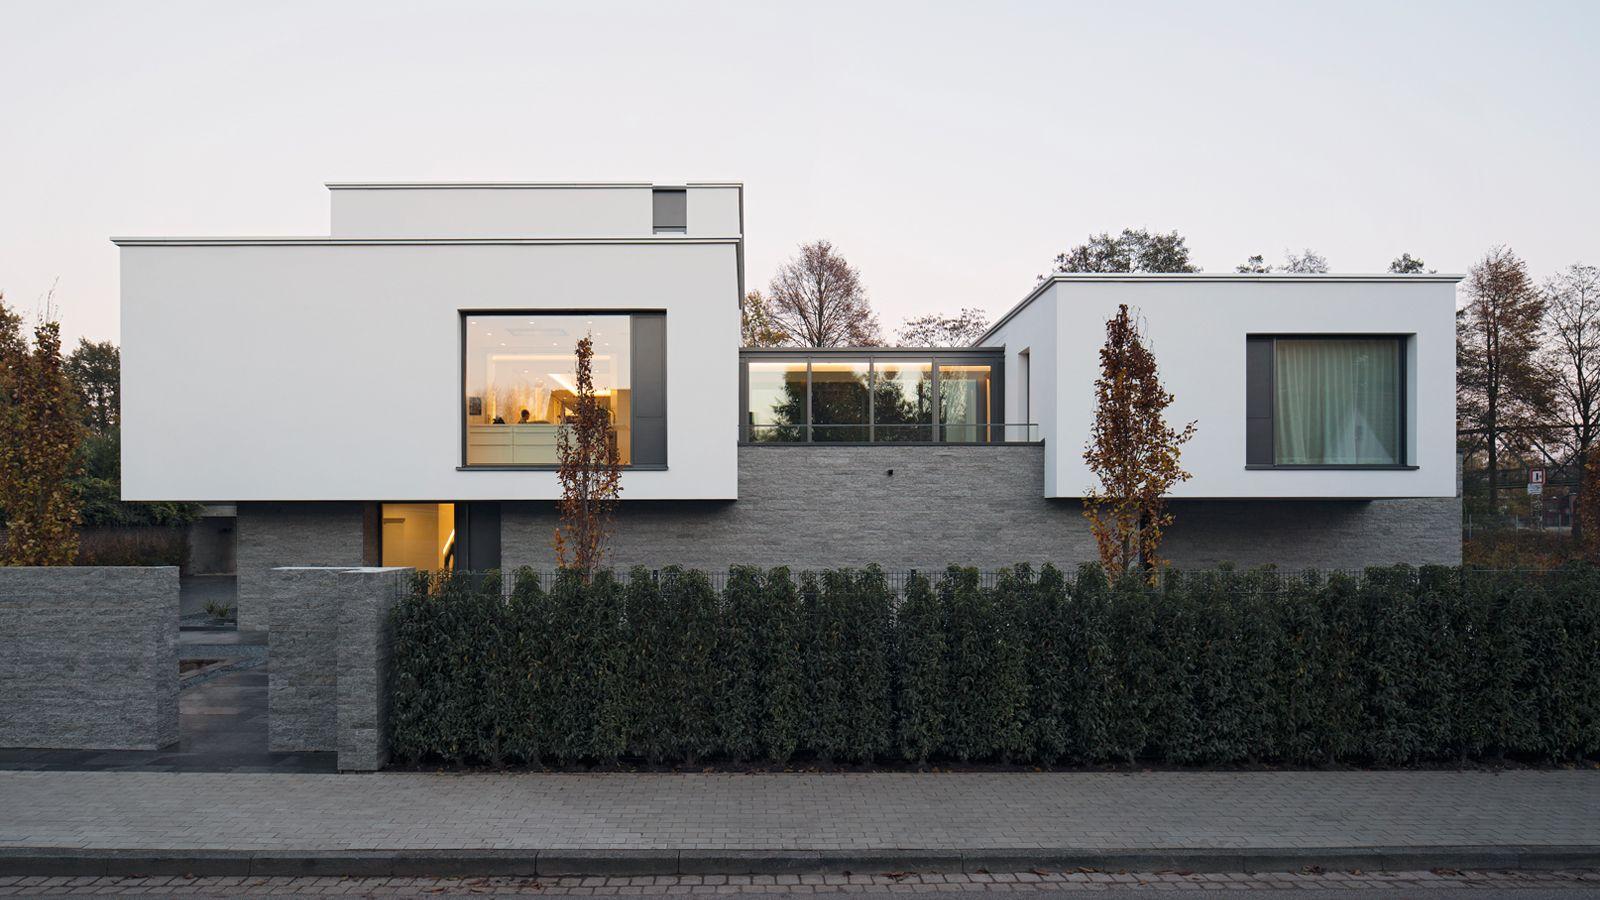 Architekten Lingen deeken architekten projekte haus am kanal lingen architecture